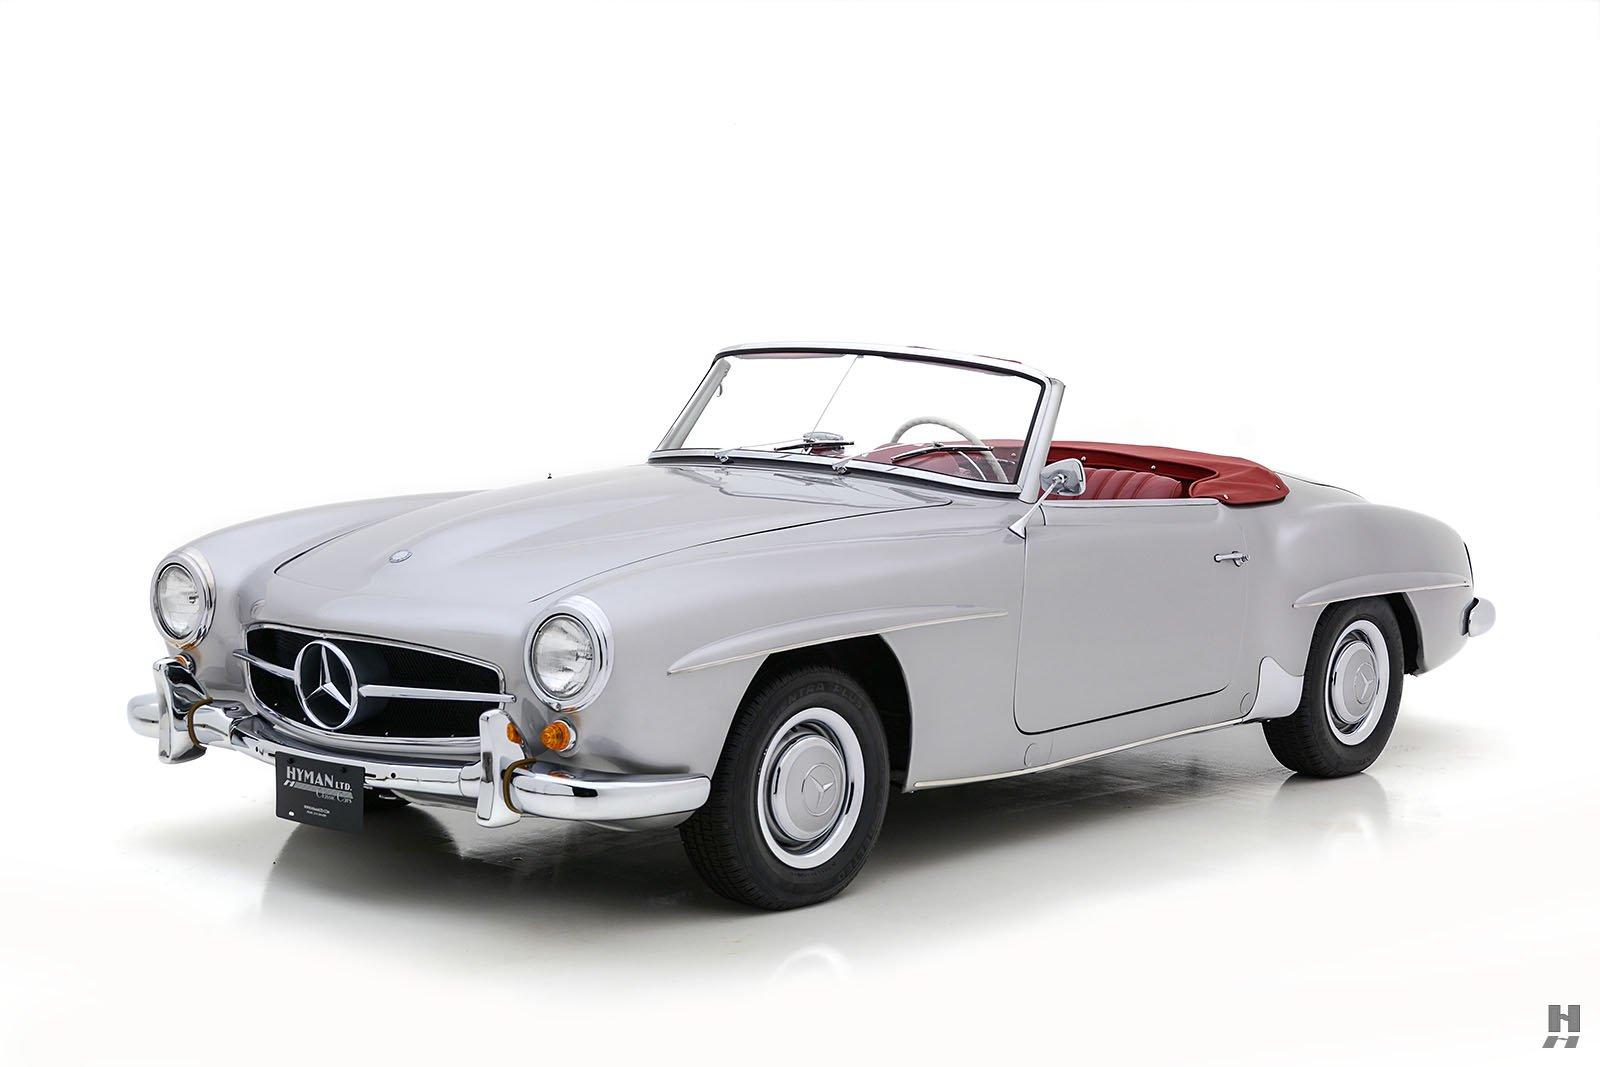 1962 Mercedes-Benz 190SL For Sale at Hyman LTD